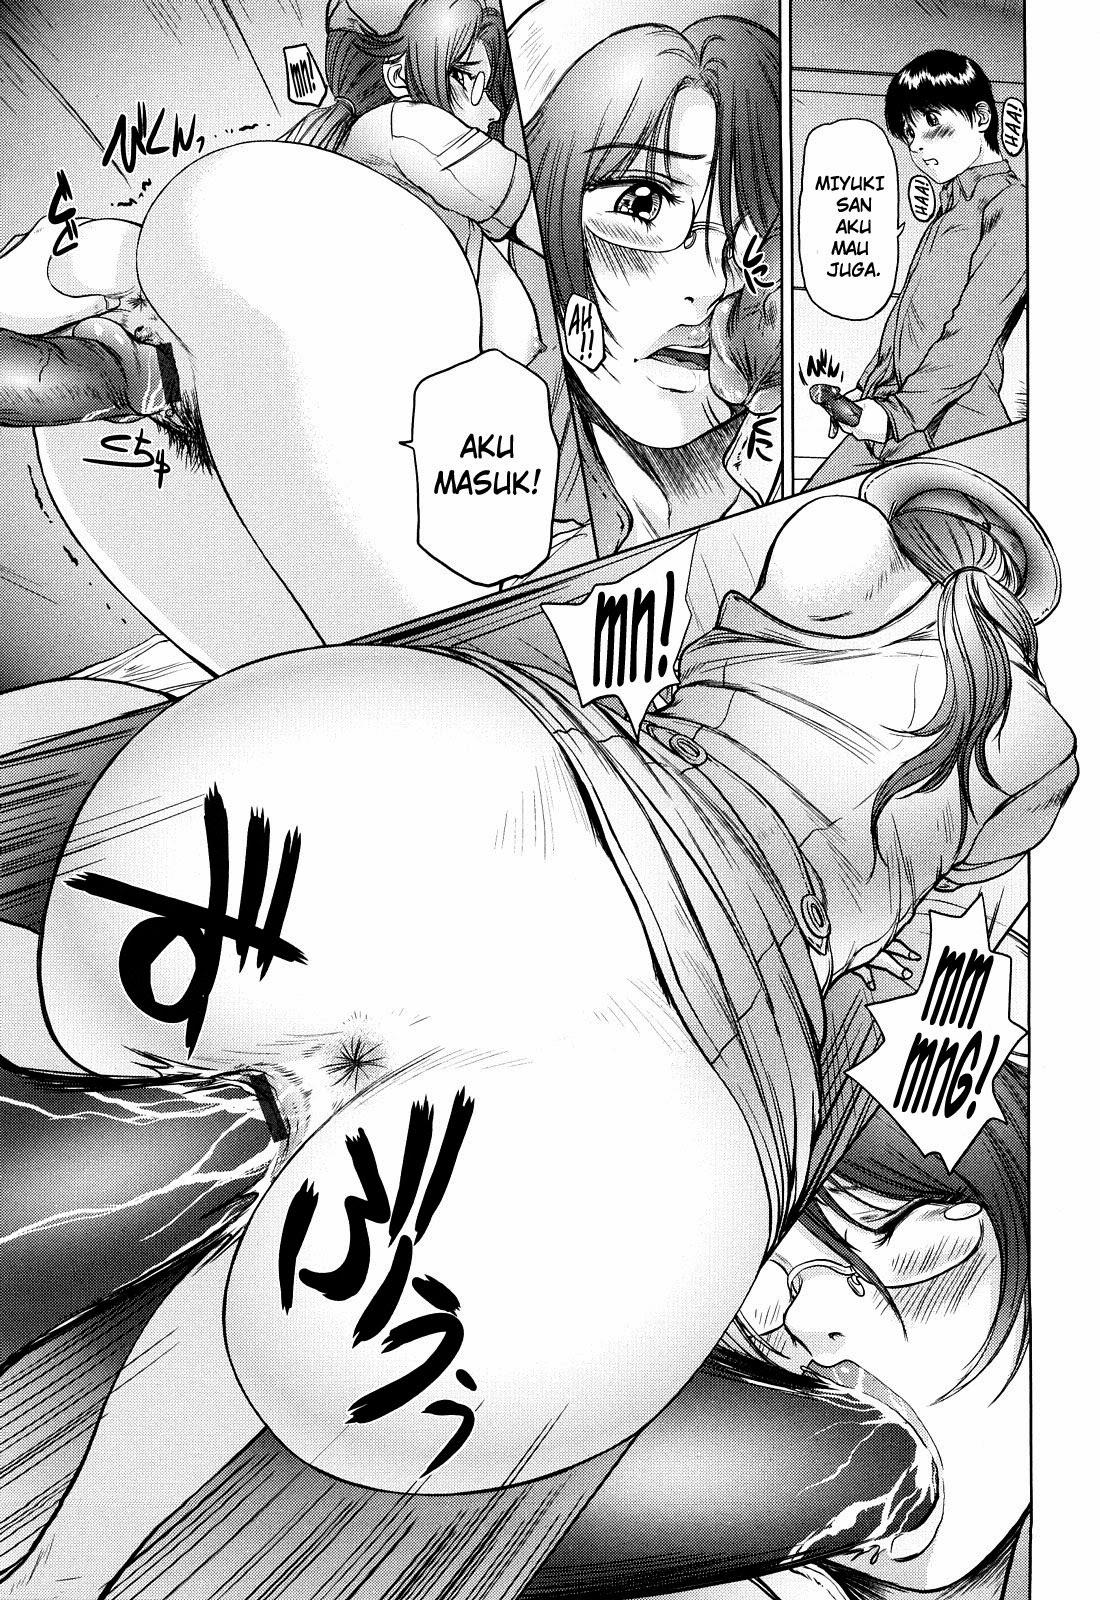 Komik Hentai Suster Semok bikin sange 2 Pasien Manga Sex Porn Doujin XXX Bokep 15